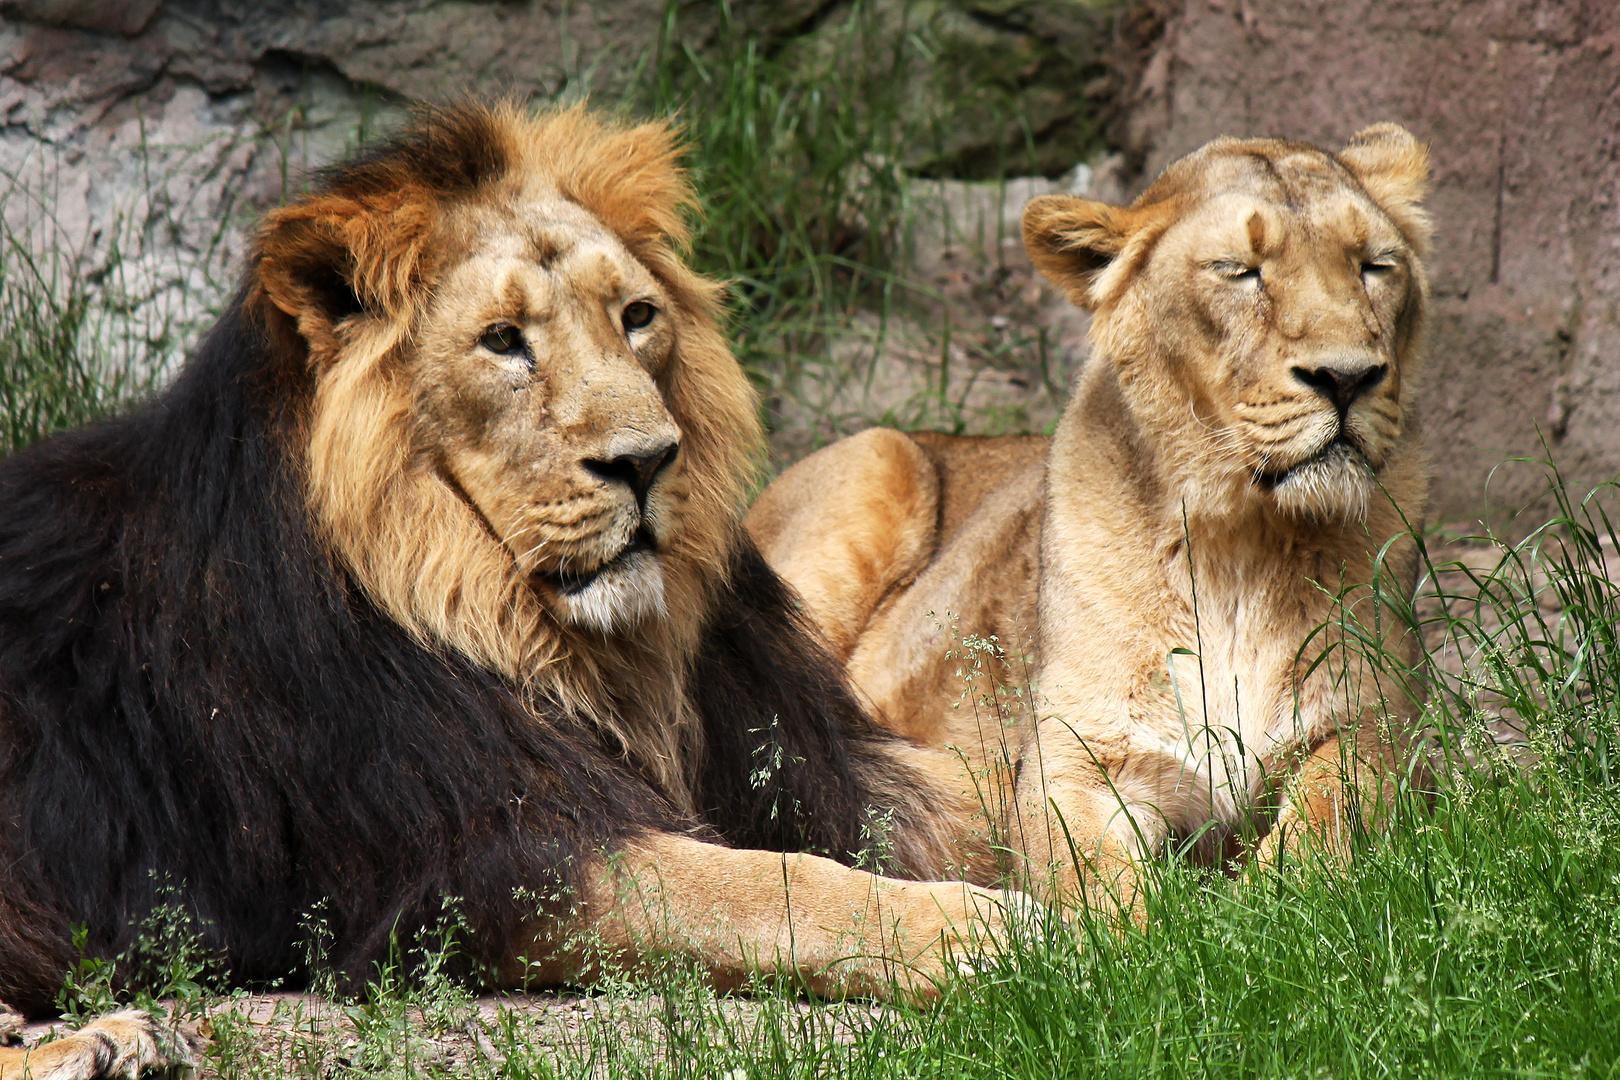 Löwen im Tierpark Nürnberg